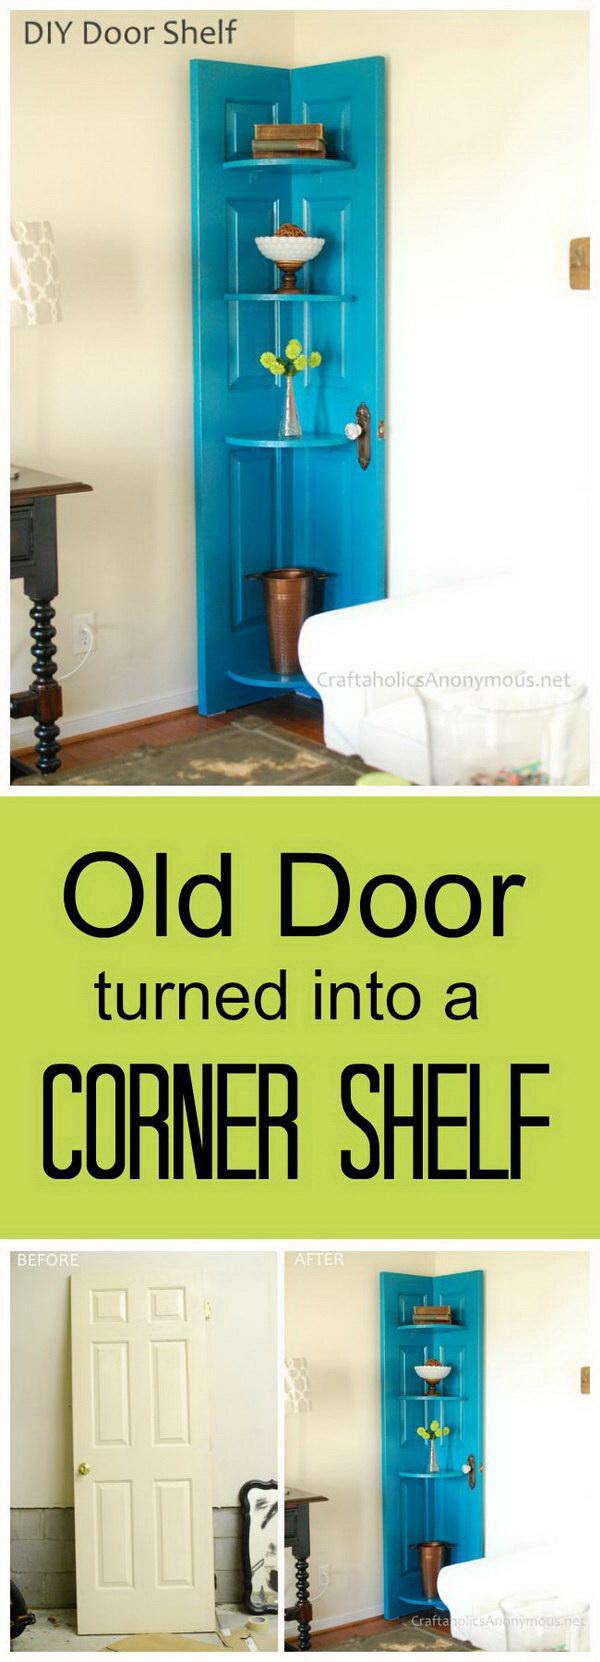 DIY Corner Door Shelf. Repurpose an old door into a stylish shelf in an unused corner of a kitchen, living area or family room.